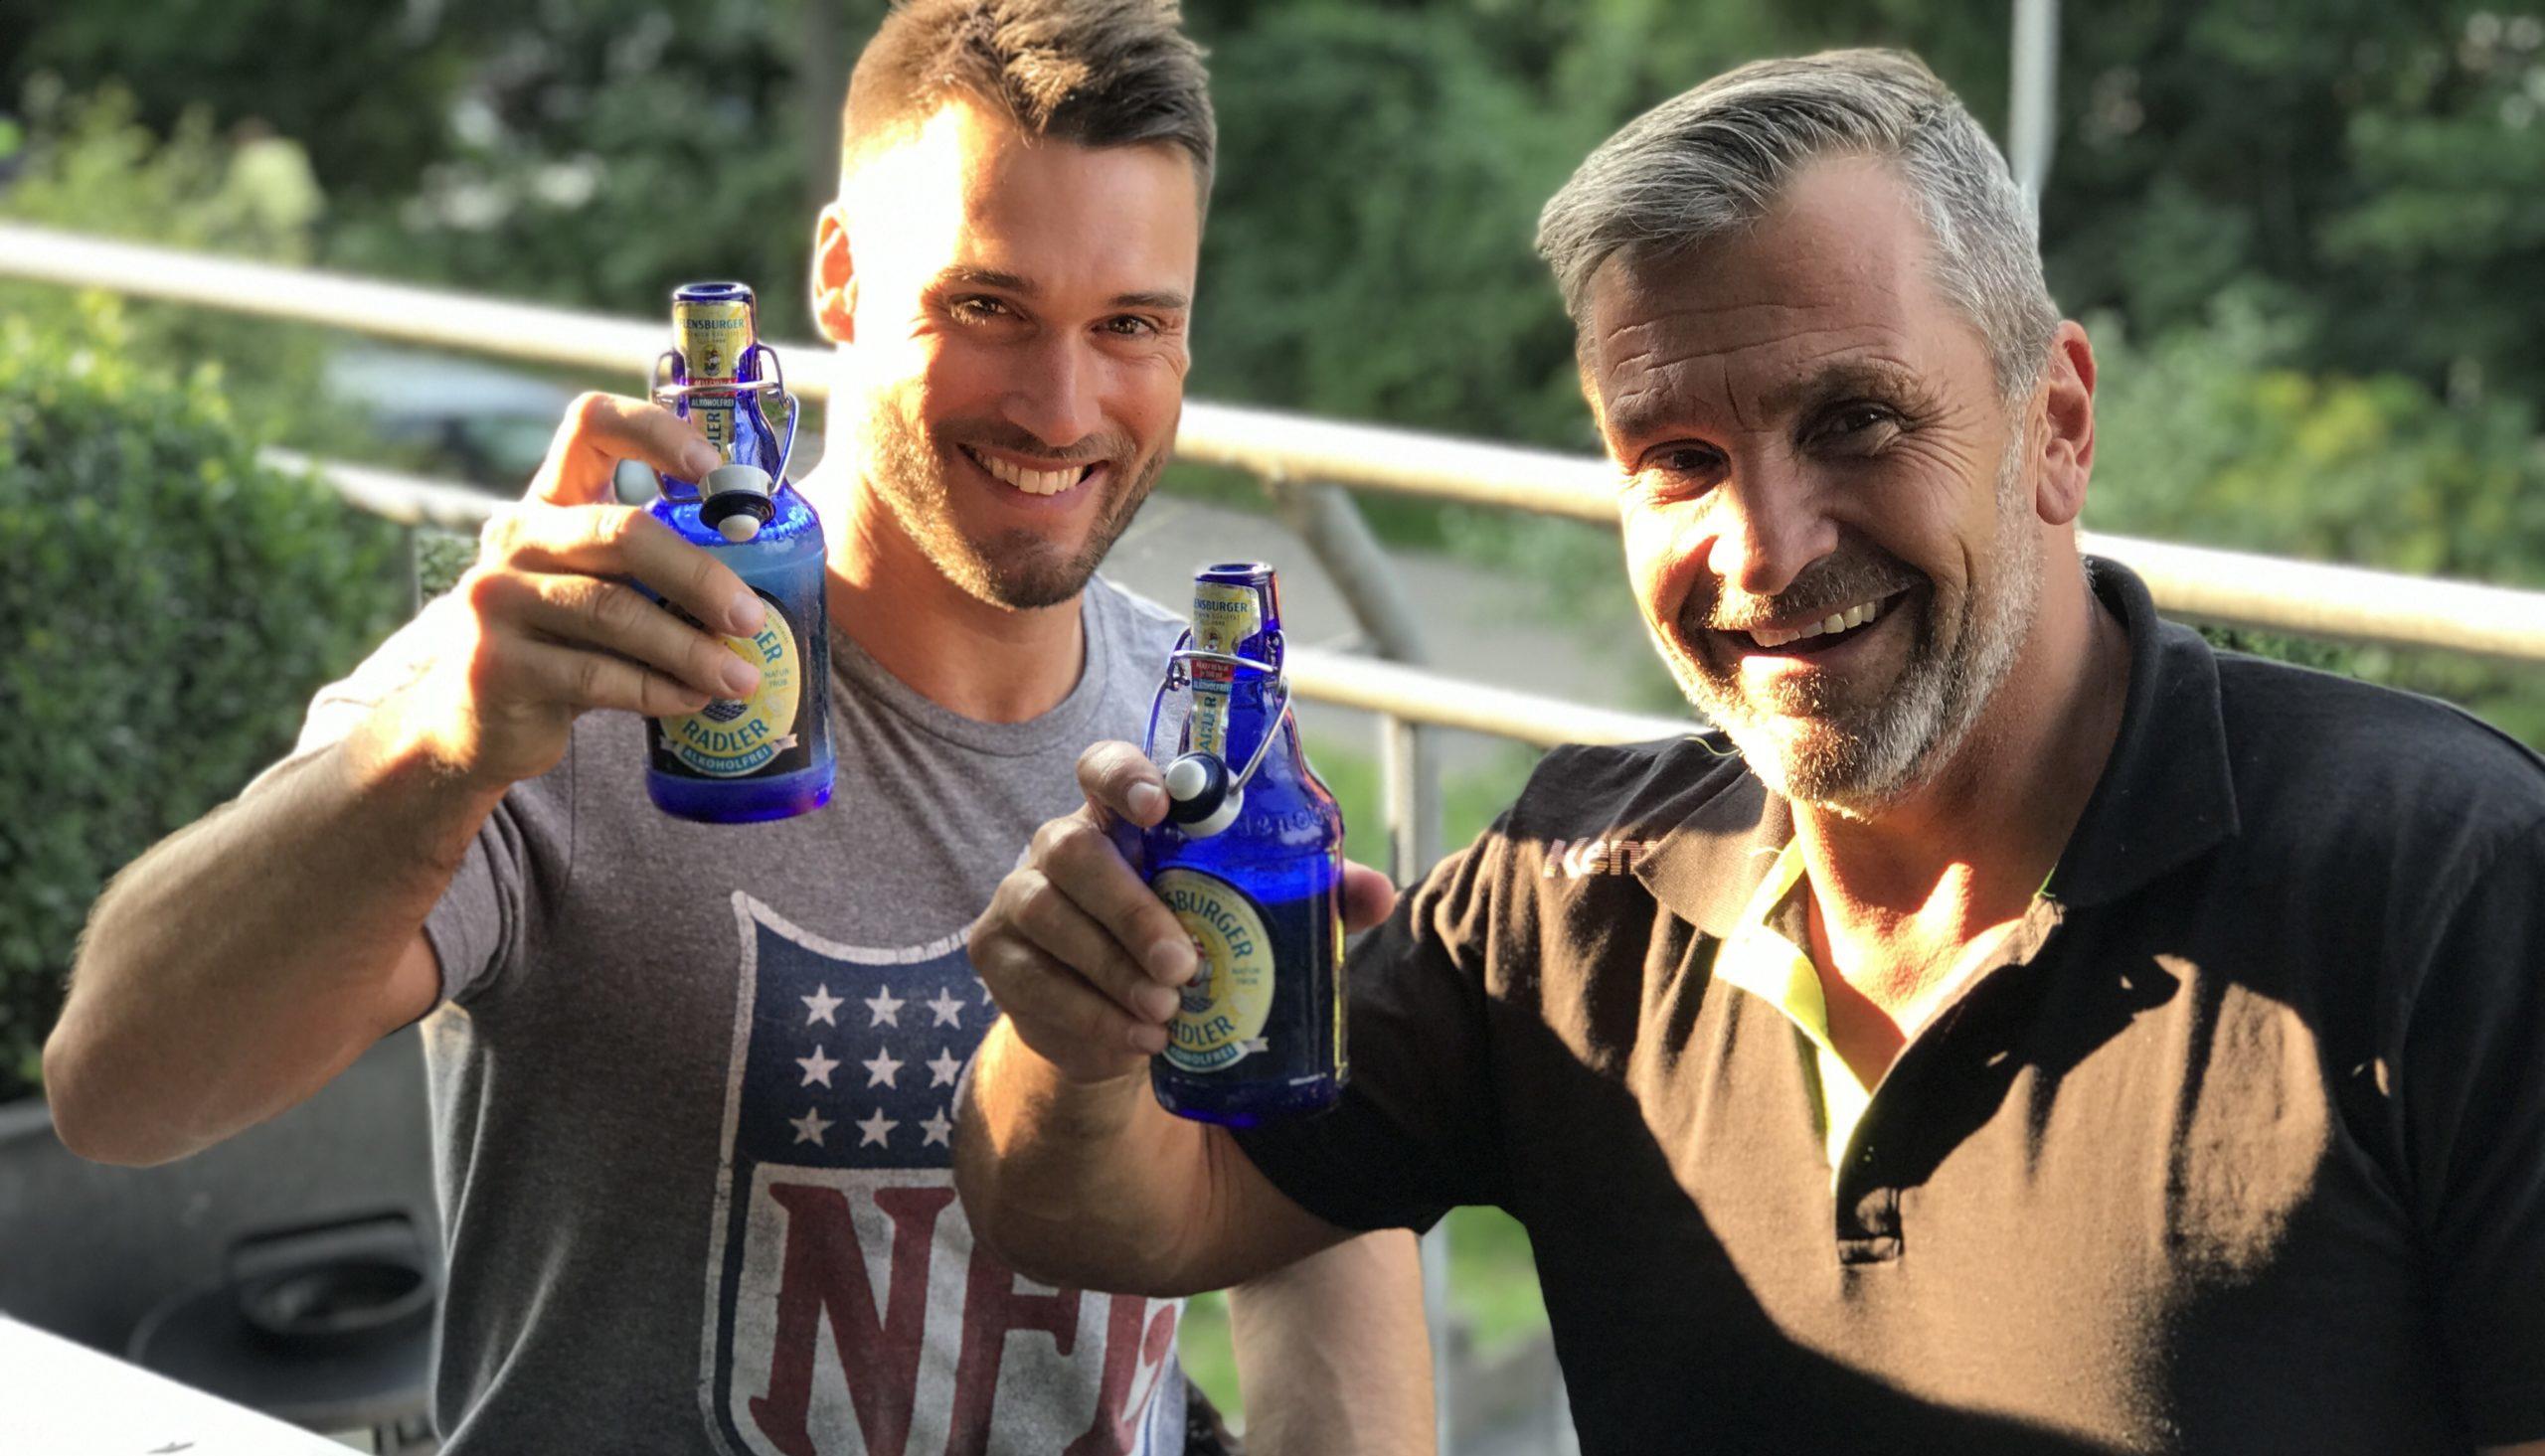 Zwei Männer stossen mit Bier an